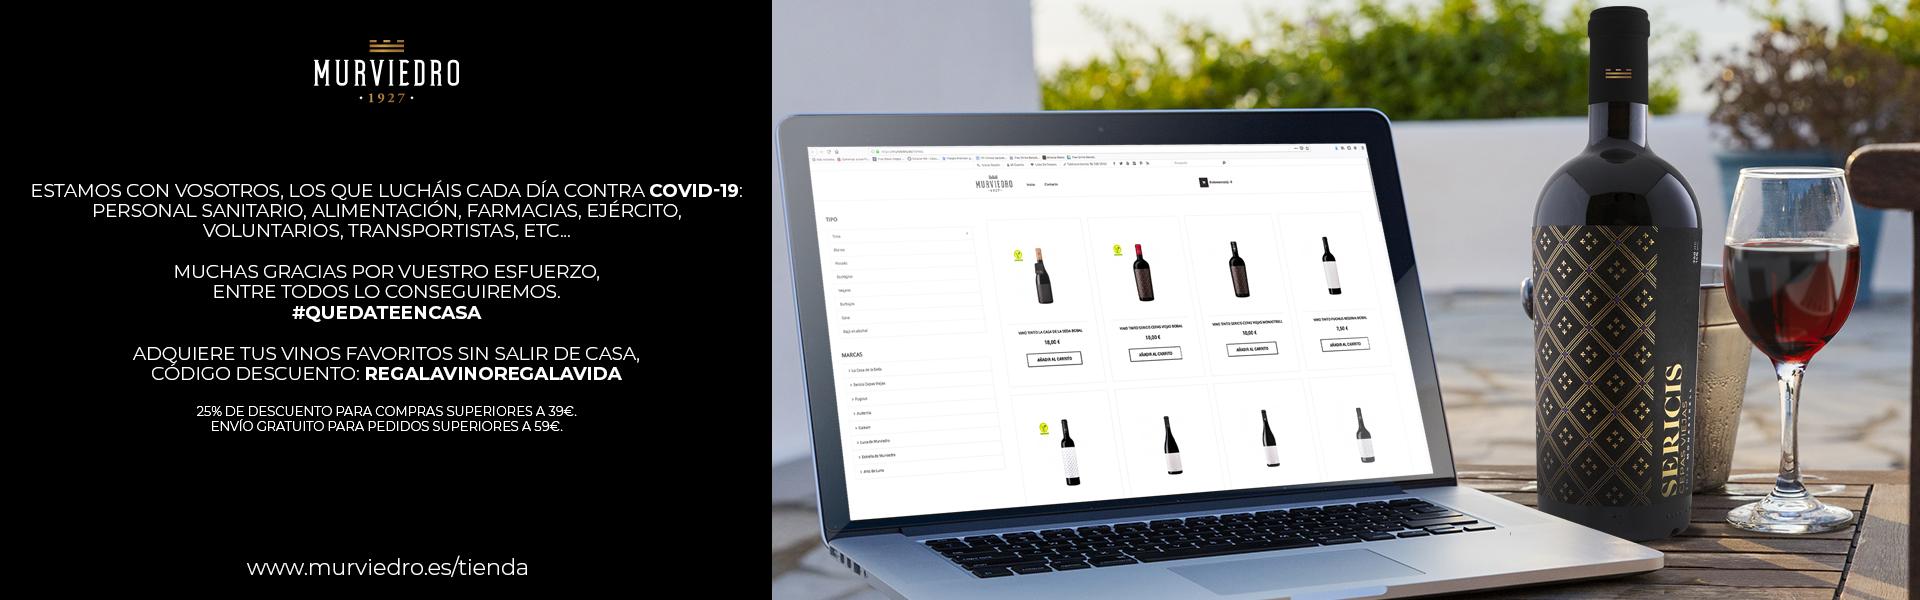 Compra vino en Bodegas Murviedro - Vino al mejor precio